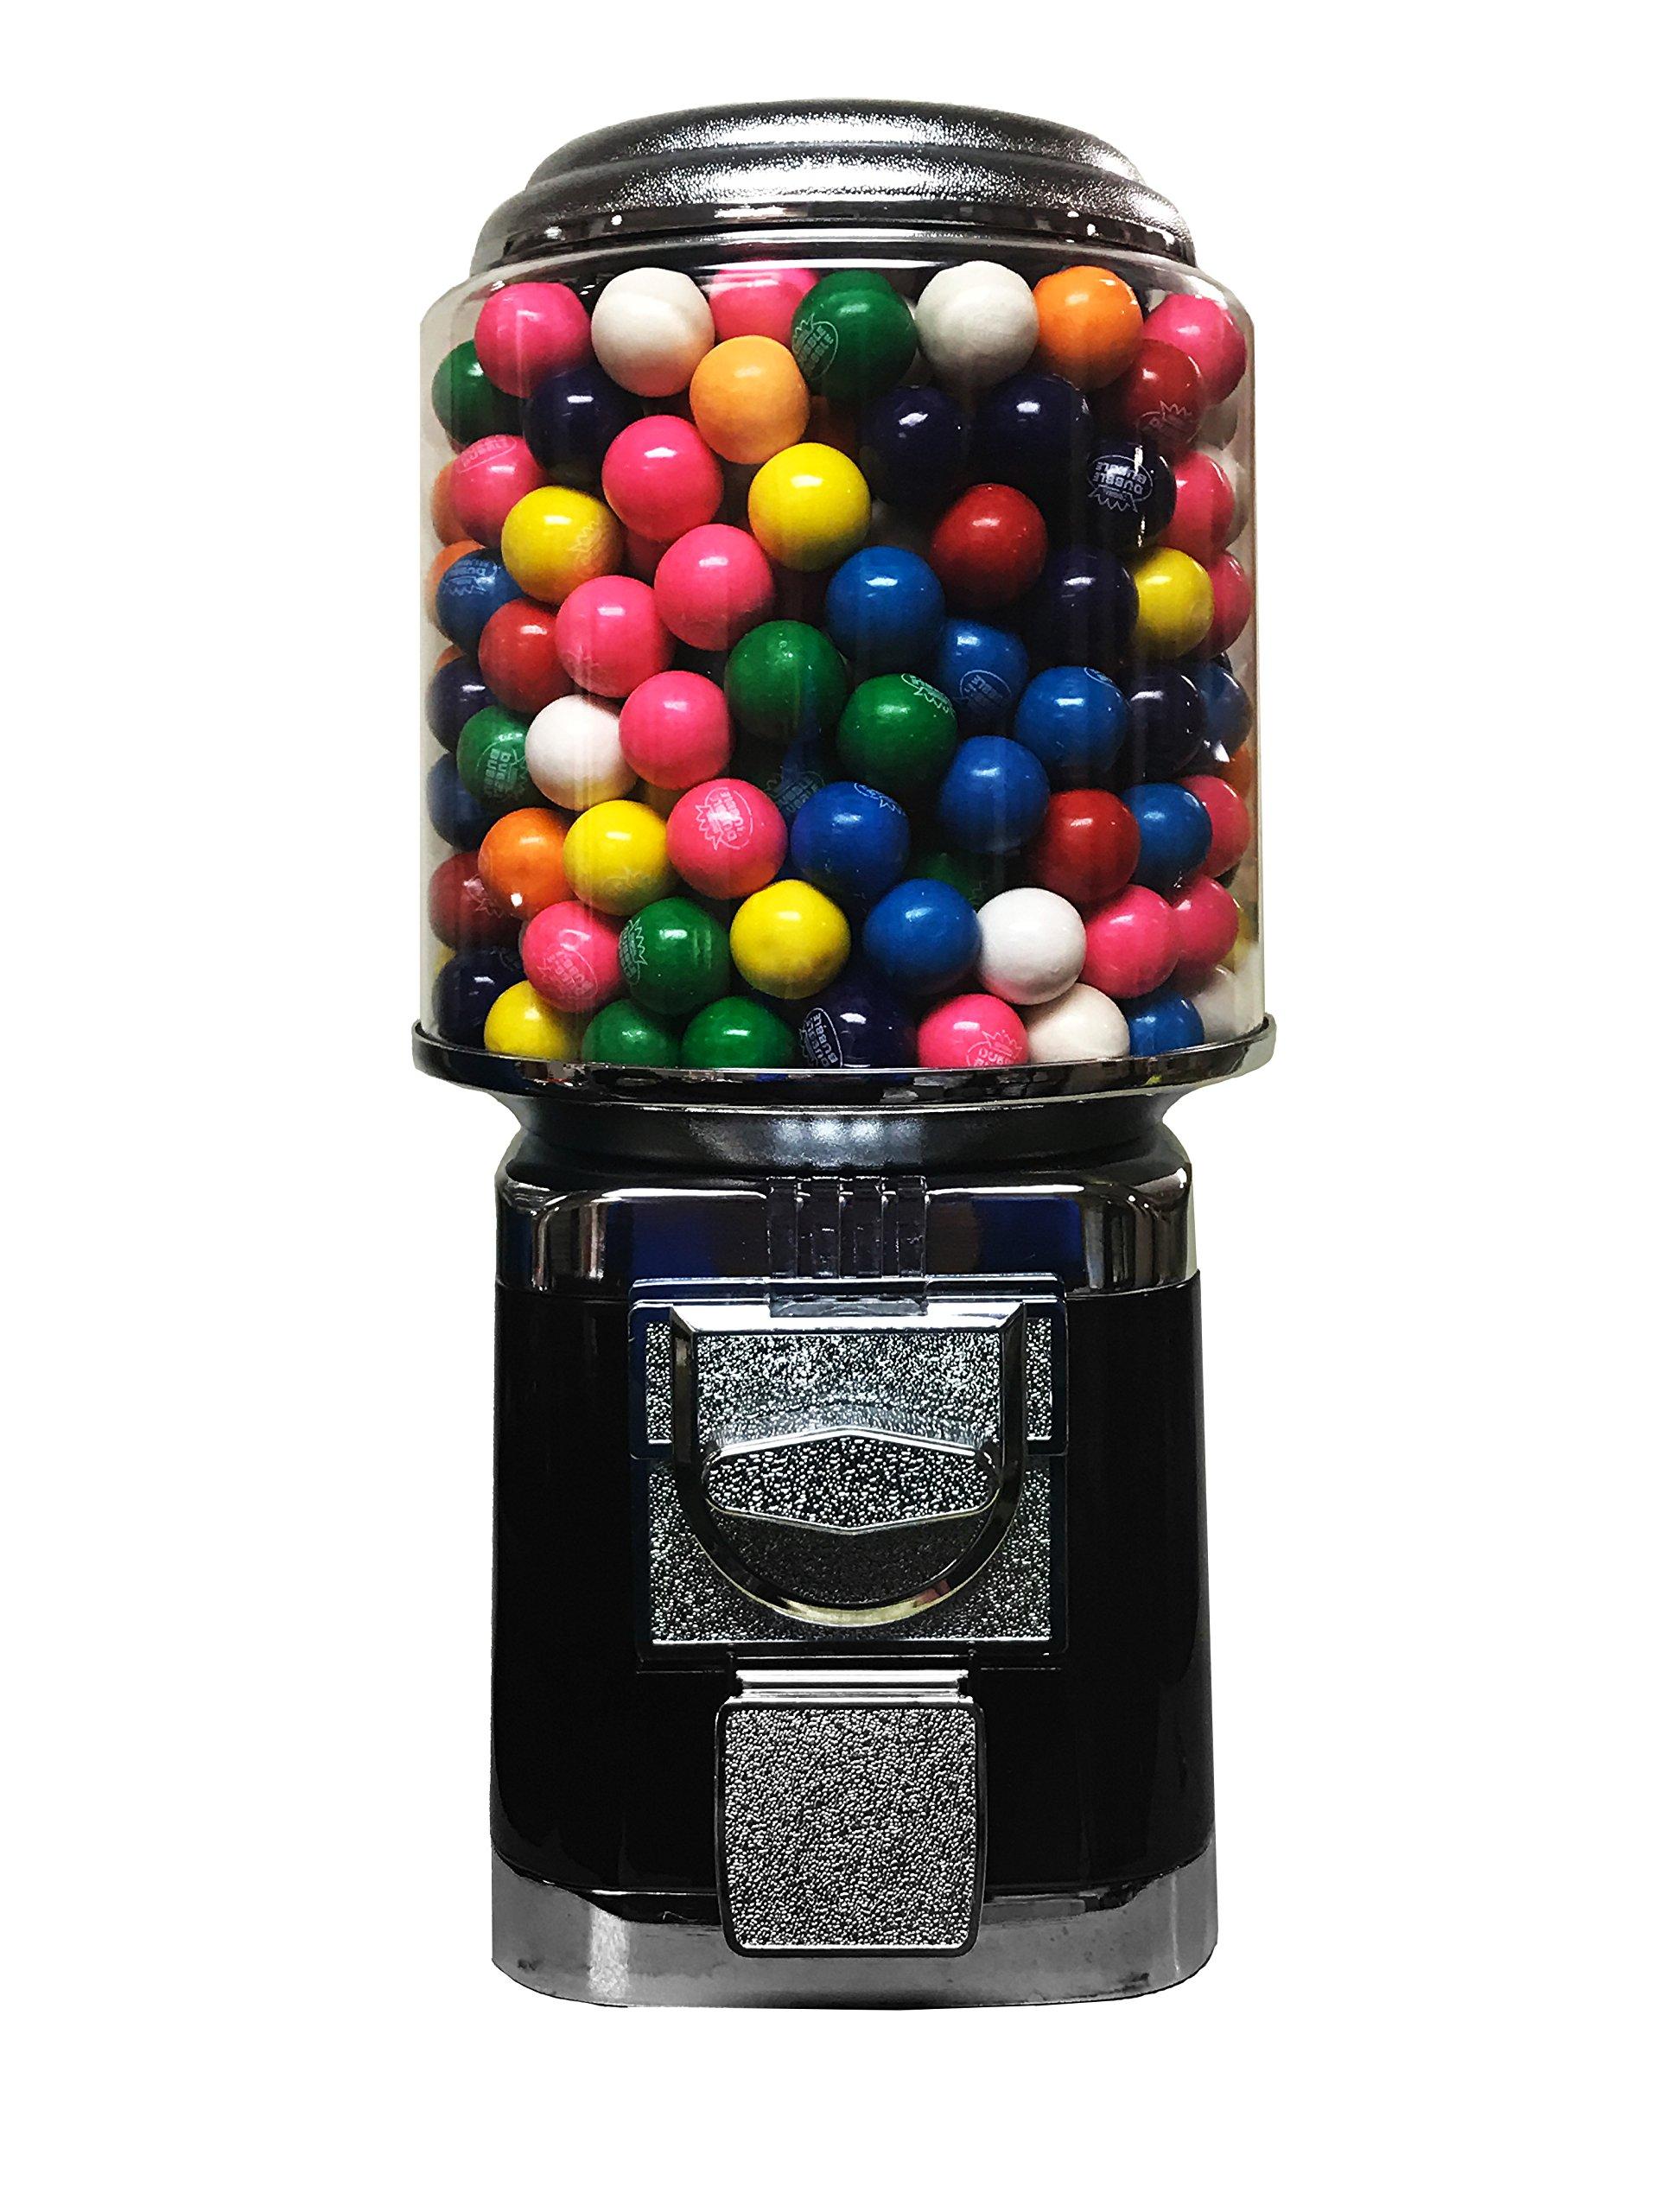 Wholesale Vending Products All Metal Bulk Vending Gumball Machine (Black)